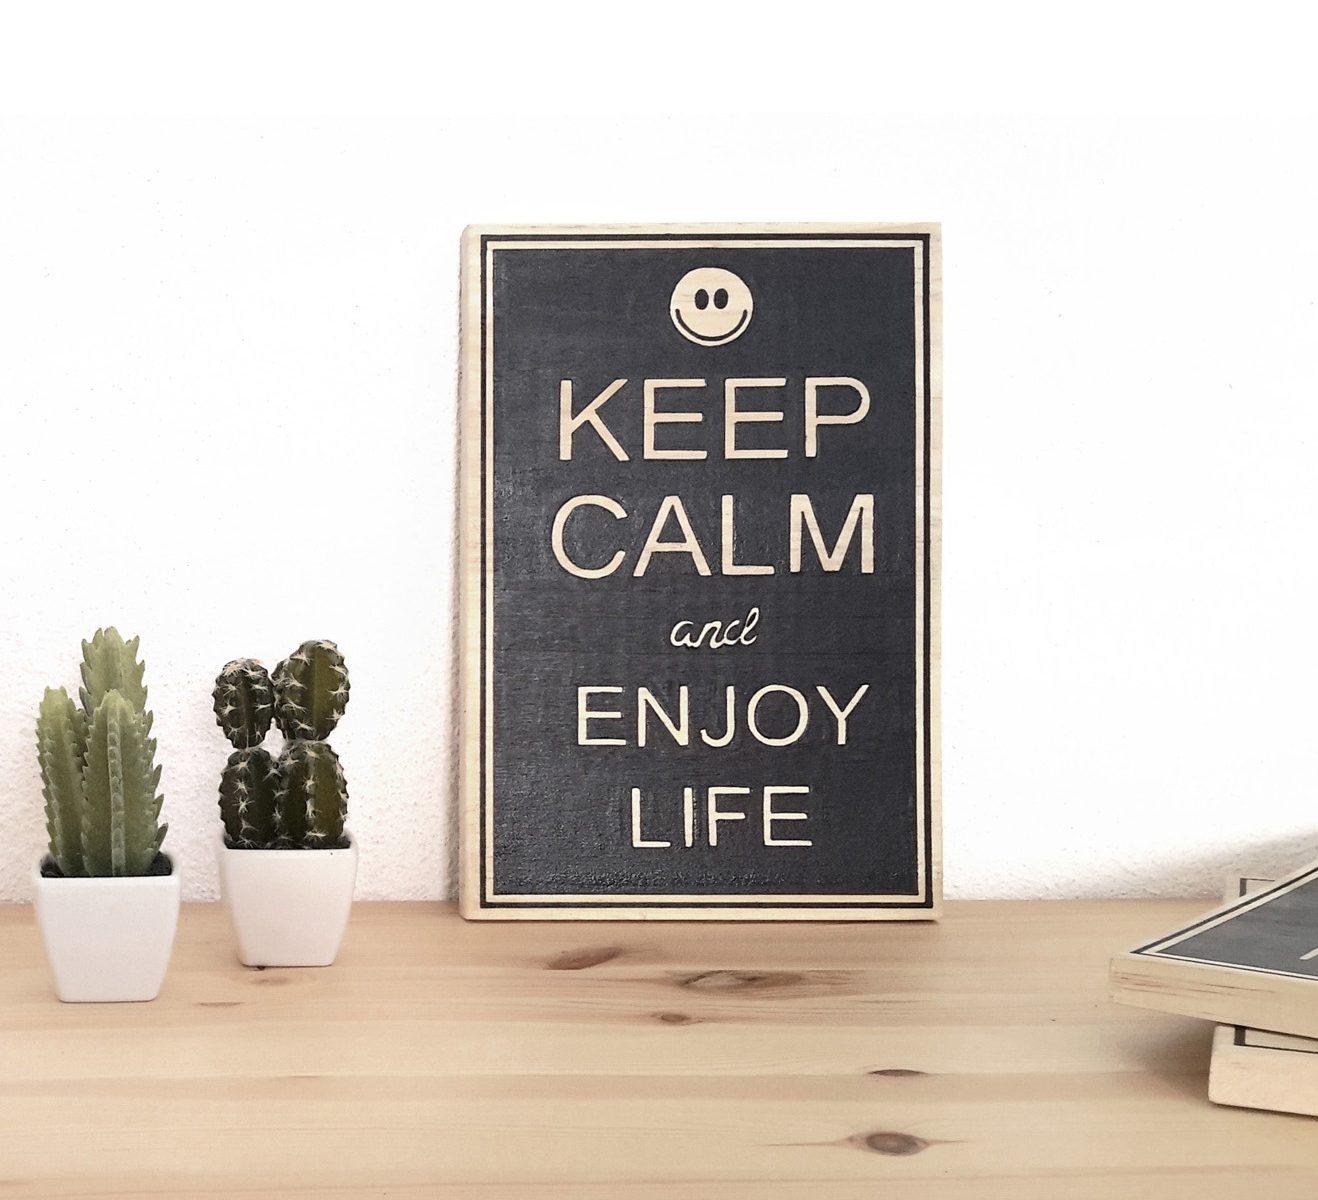 Keep Calm and Enjoy Life tableau en bois naturel et noir